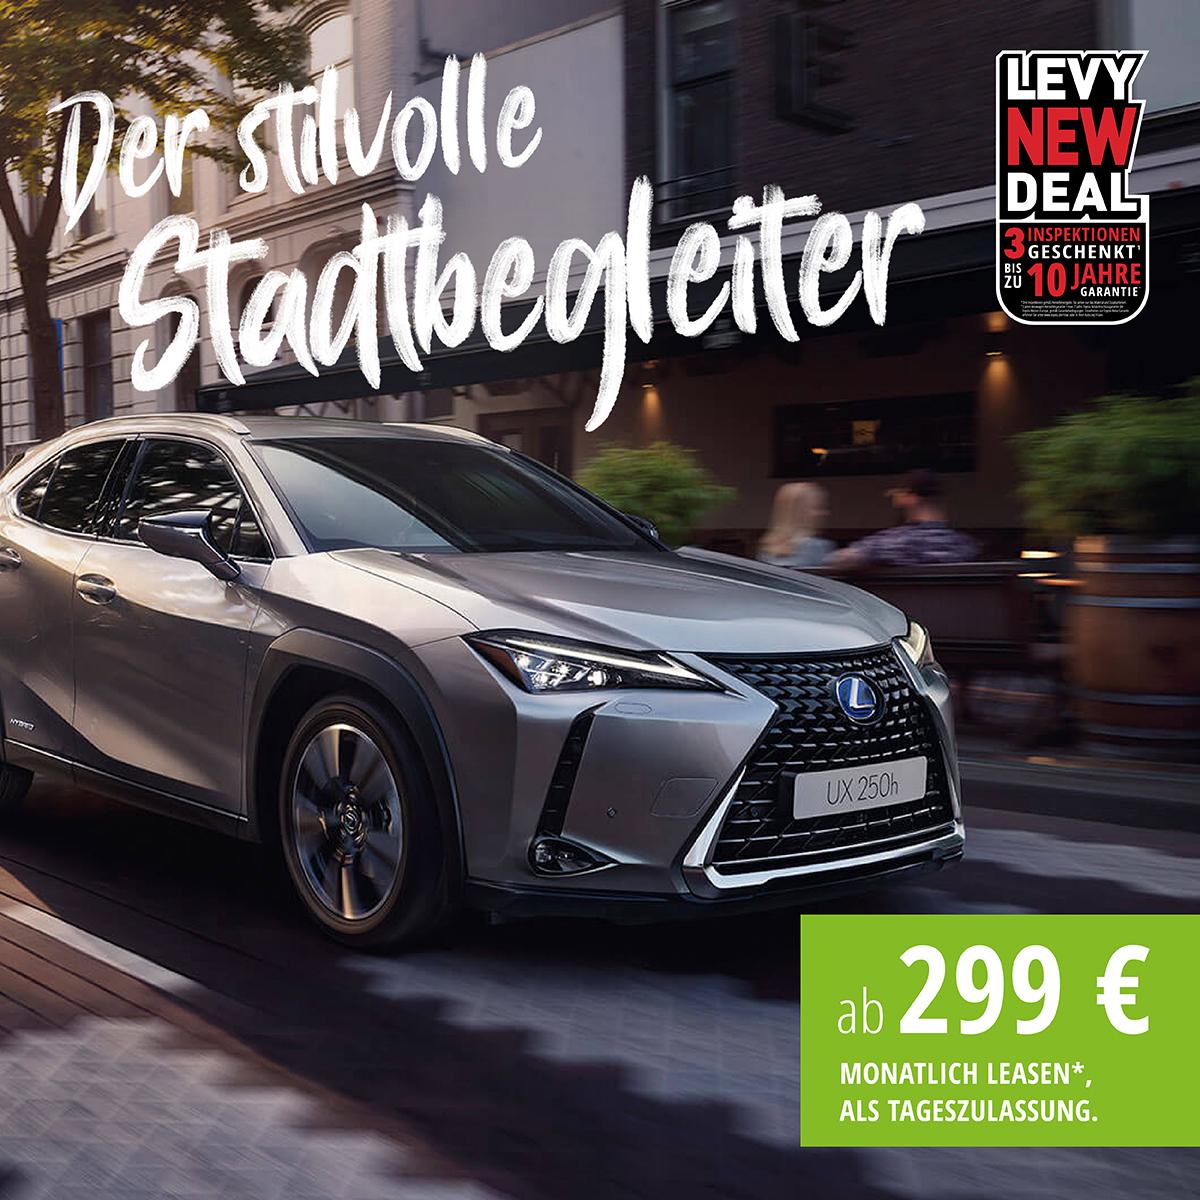 Lexus UX 250h Style Edition<br>Hybrid, stufenloses Automatikgetriebe, 5-Türer